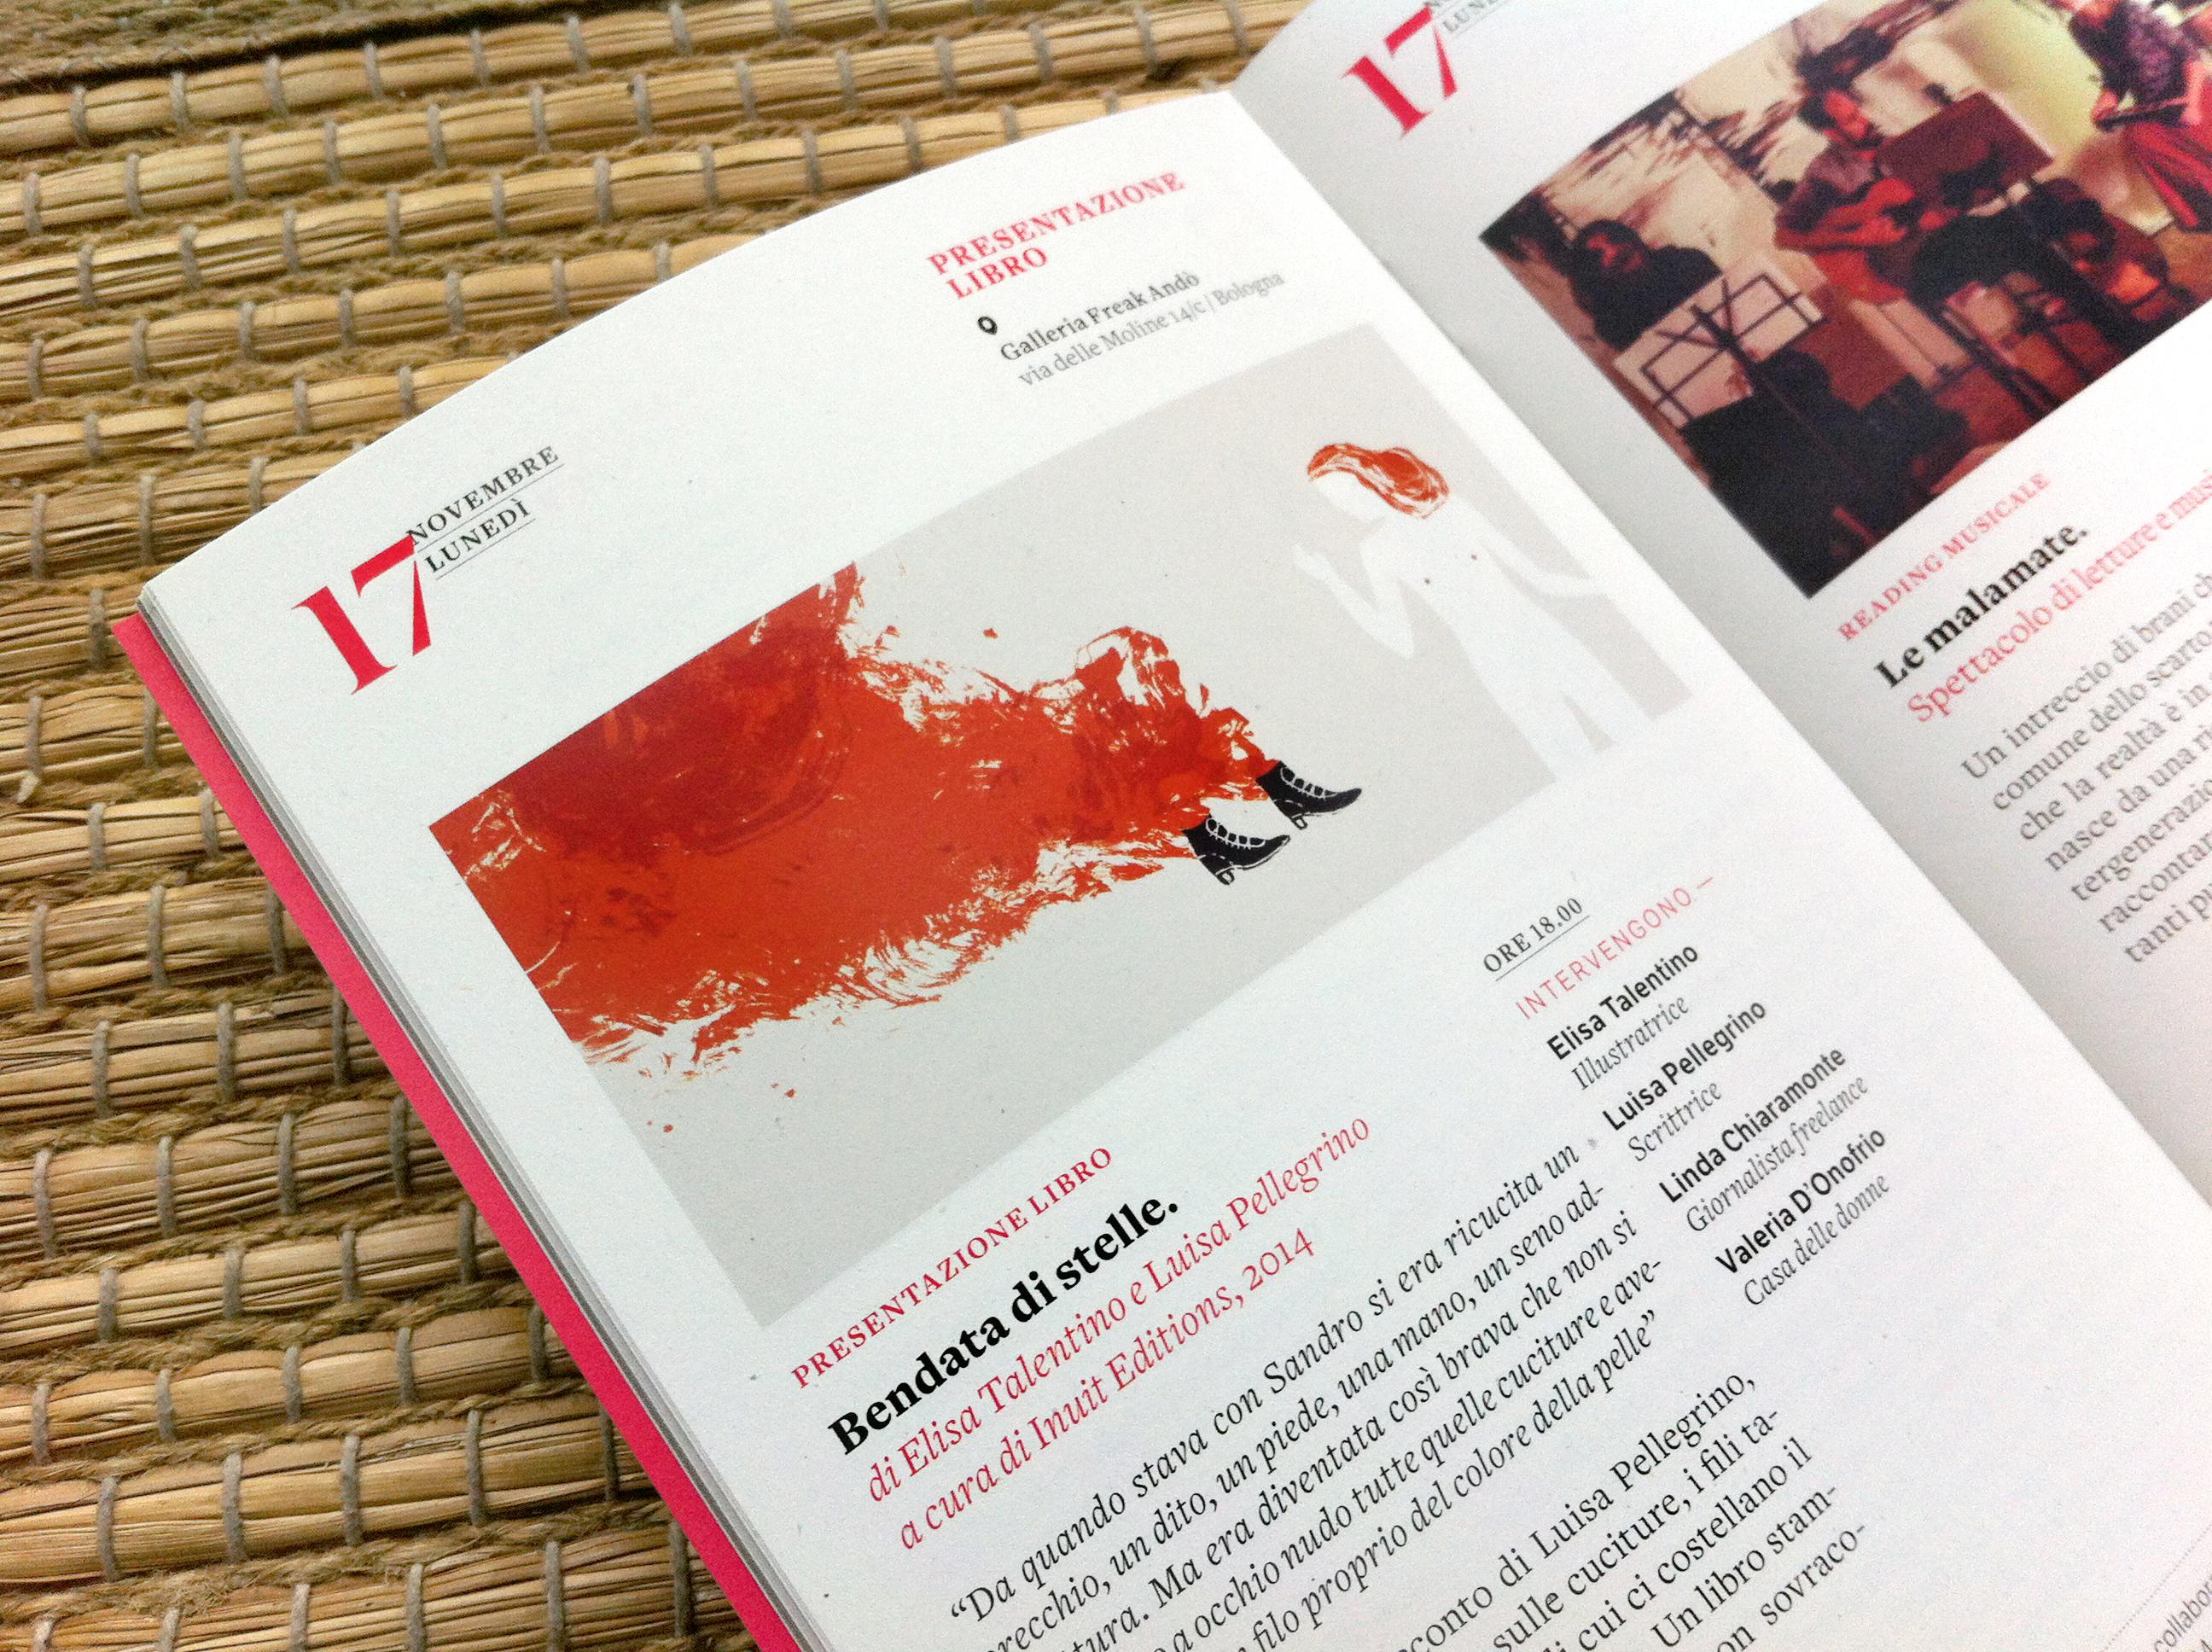 Programma Violenza Illustrata 2014